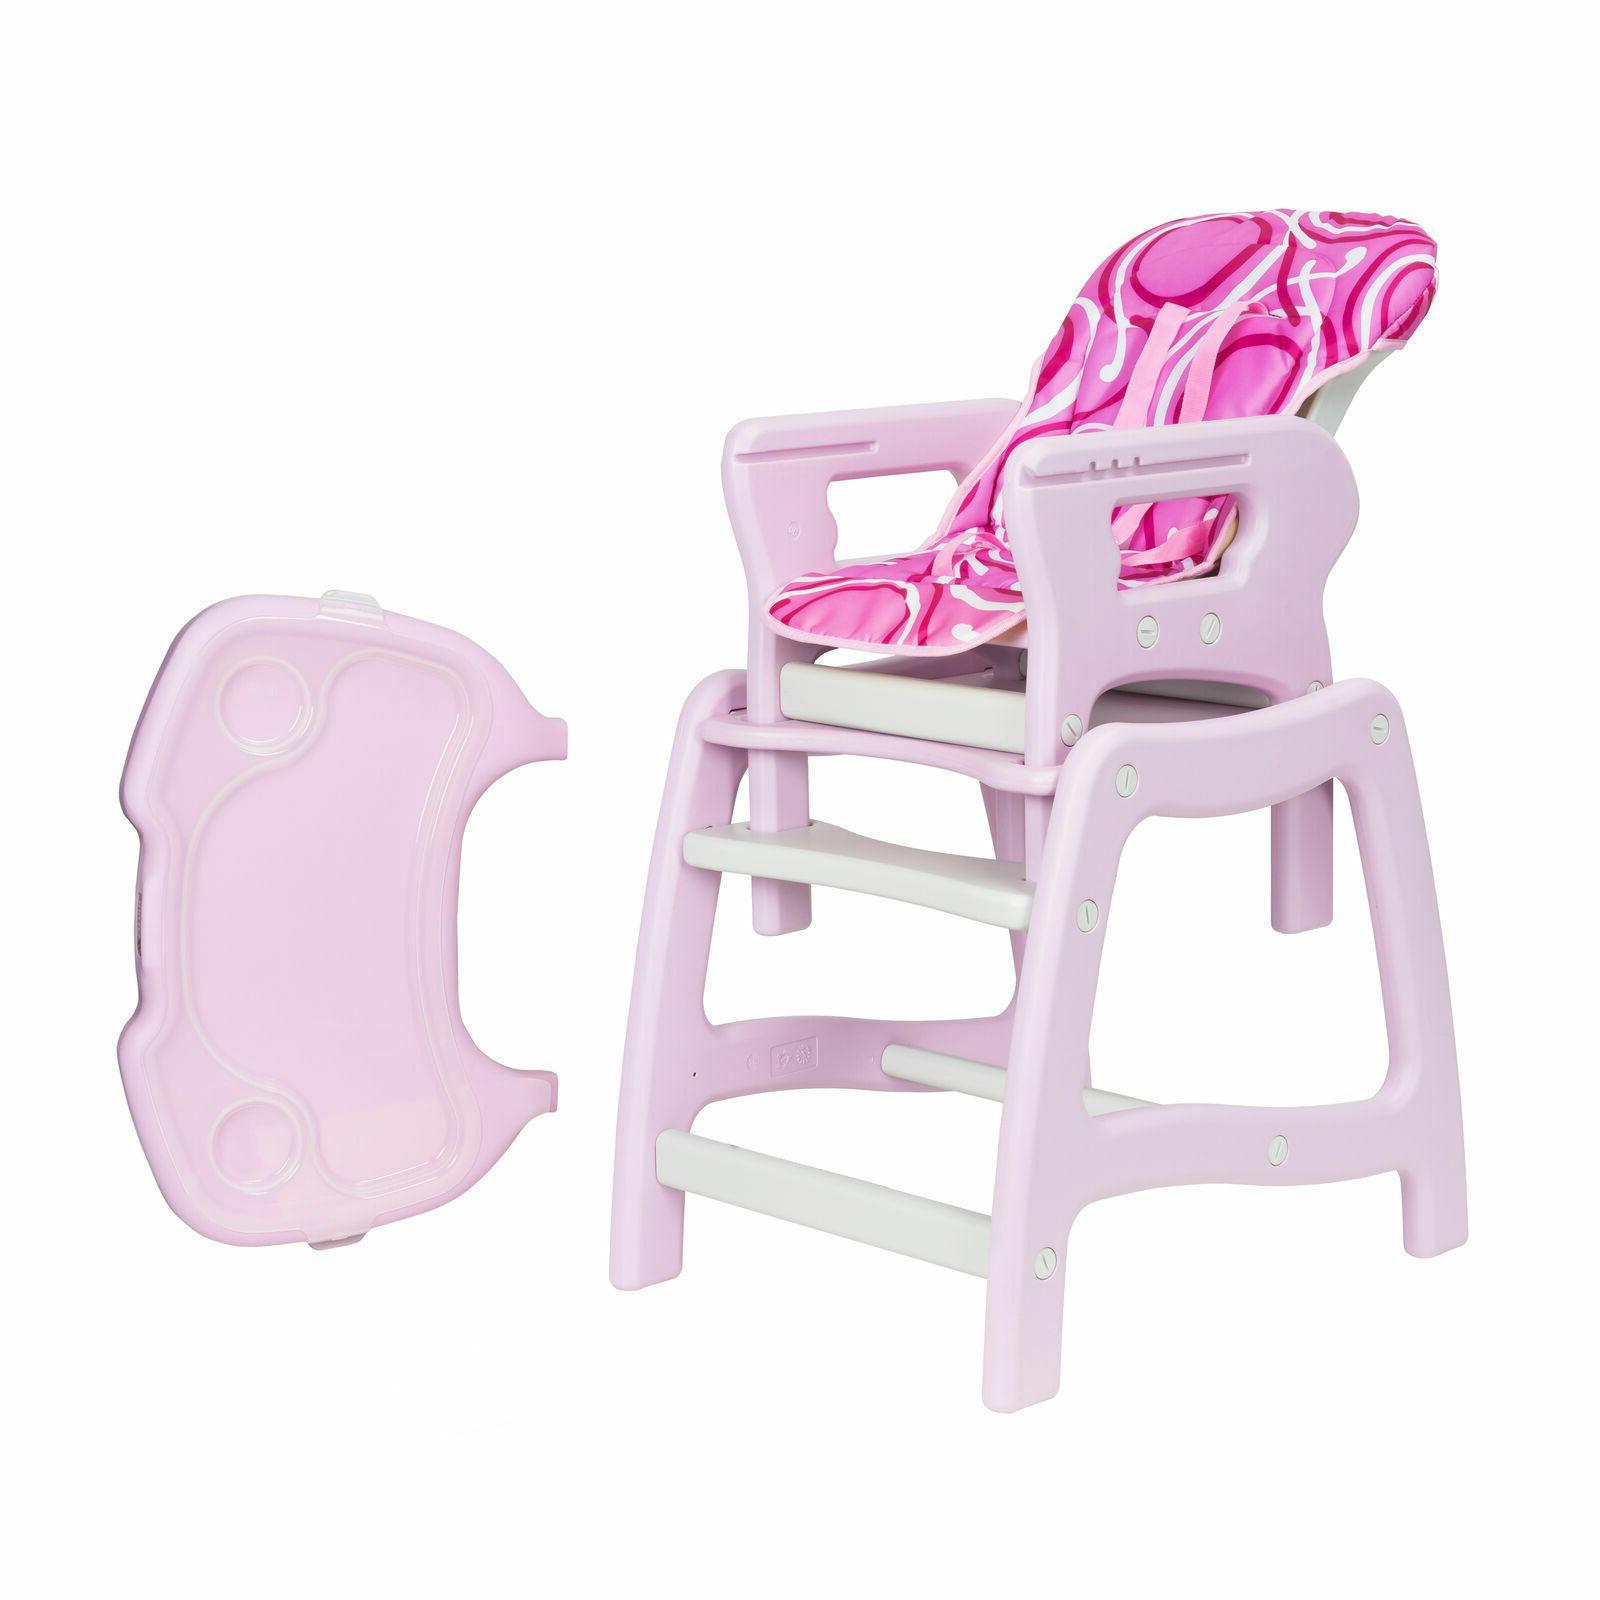 Convertible Baby Feeding Seat Toddler Infant Pink